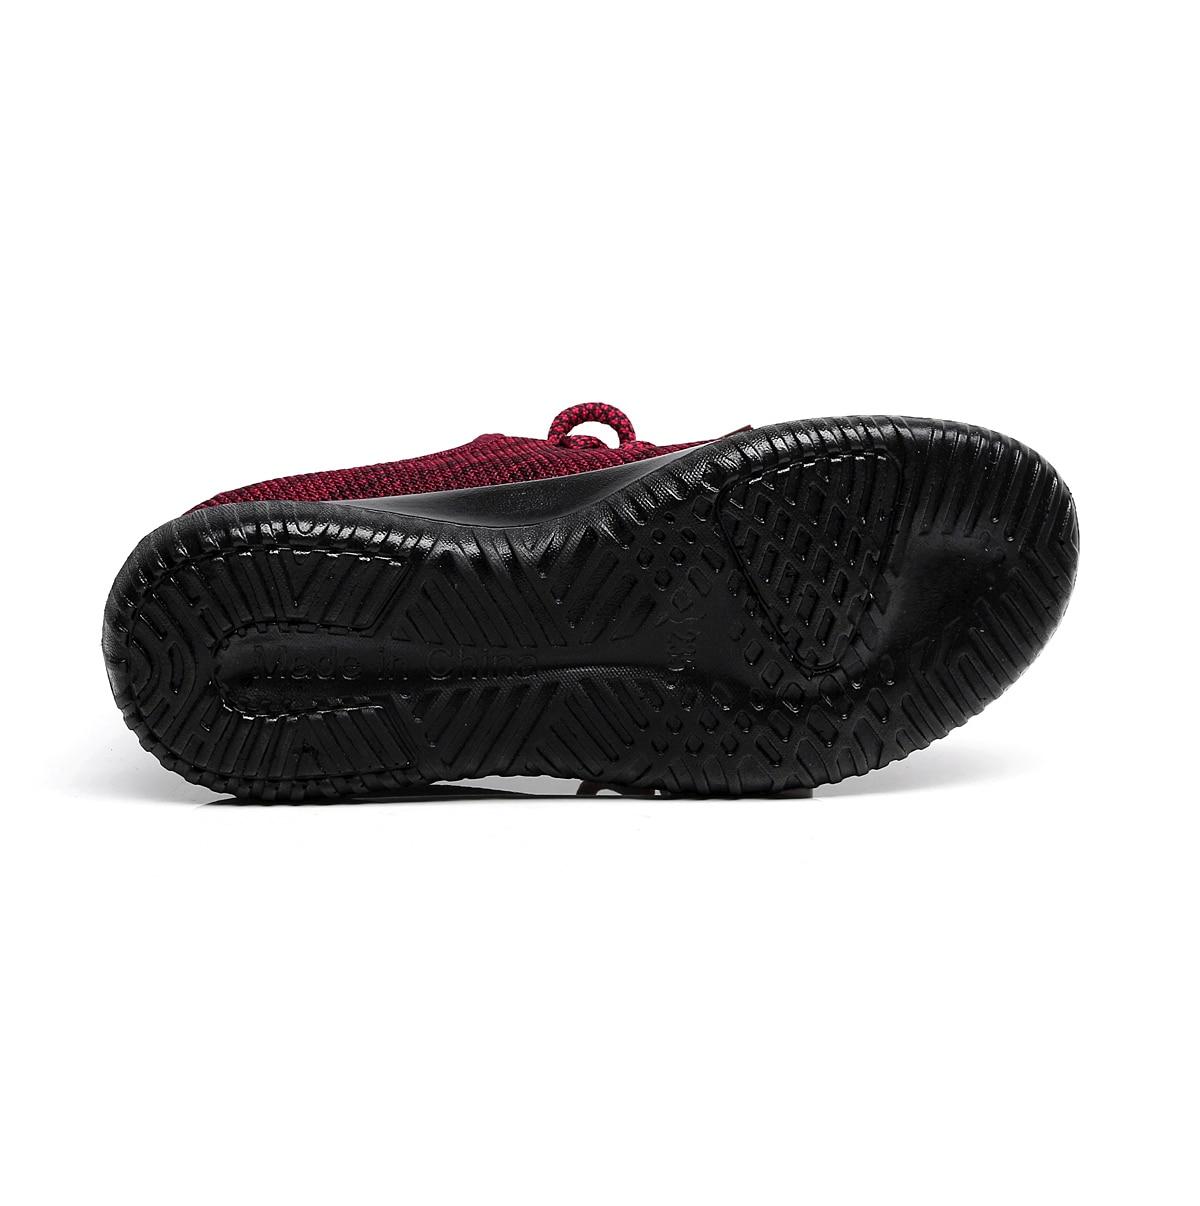 OrientPostMark Women Casual Sneakers Shoes Breathable Handmade Women Sneaker Shoes Comfortable LightWeight Walking Female Flats in Women 39 s Flats from Shoes